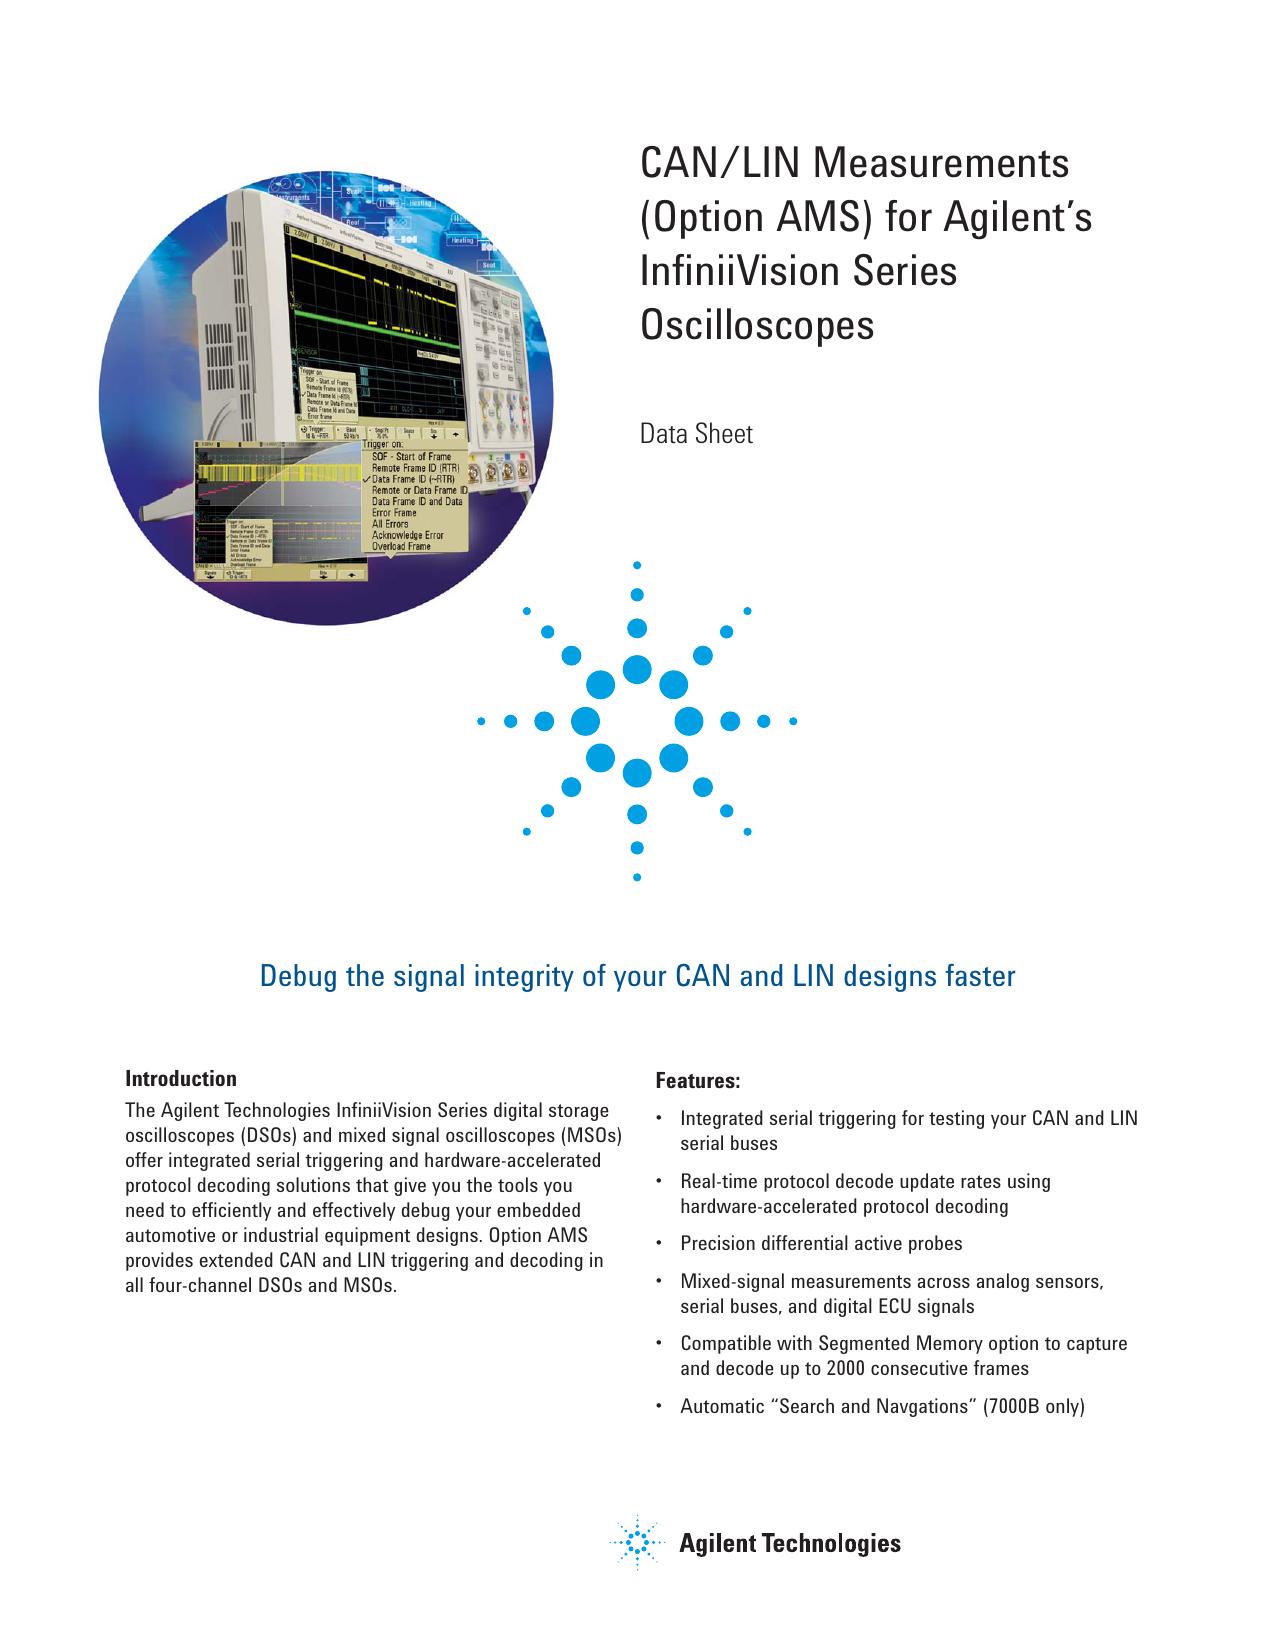 CAN/LIN Measurements (Option AMS) for Agilent`s